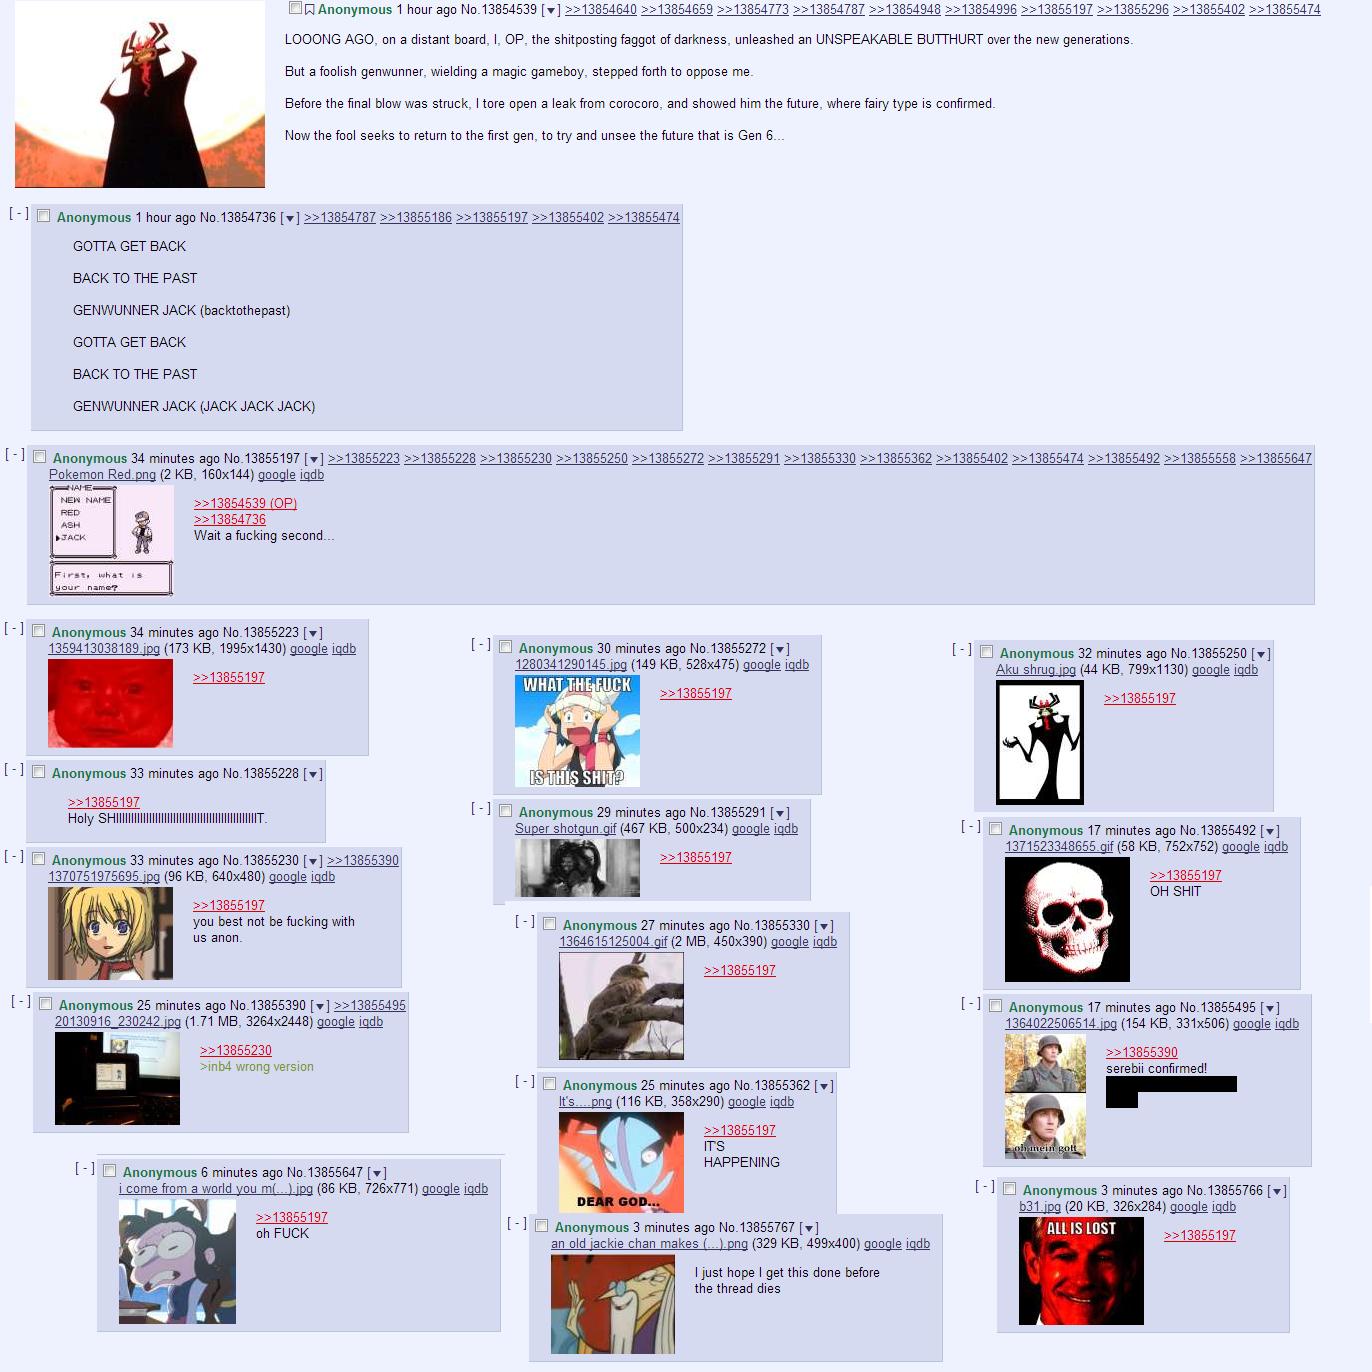 4chan. . SCIENCING AGO, en a distant board, l, (OP, the shitposting faggot , unleashed an UNSPEAKABLE new generations. But a foolish genwunner, wielding a magic aku 4Chan